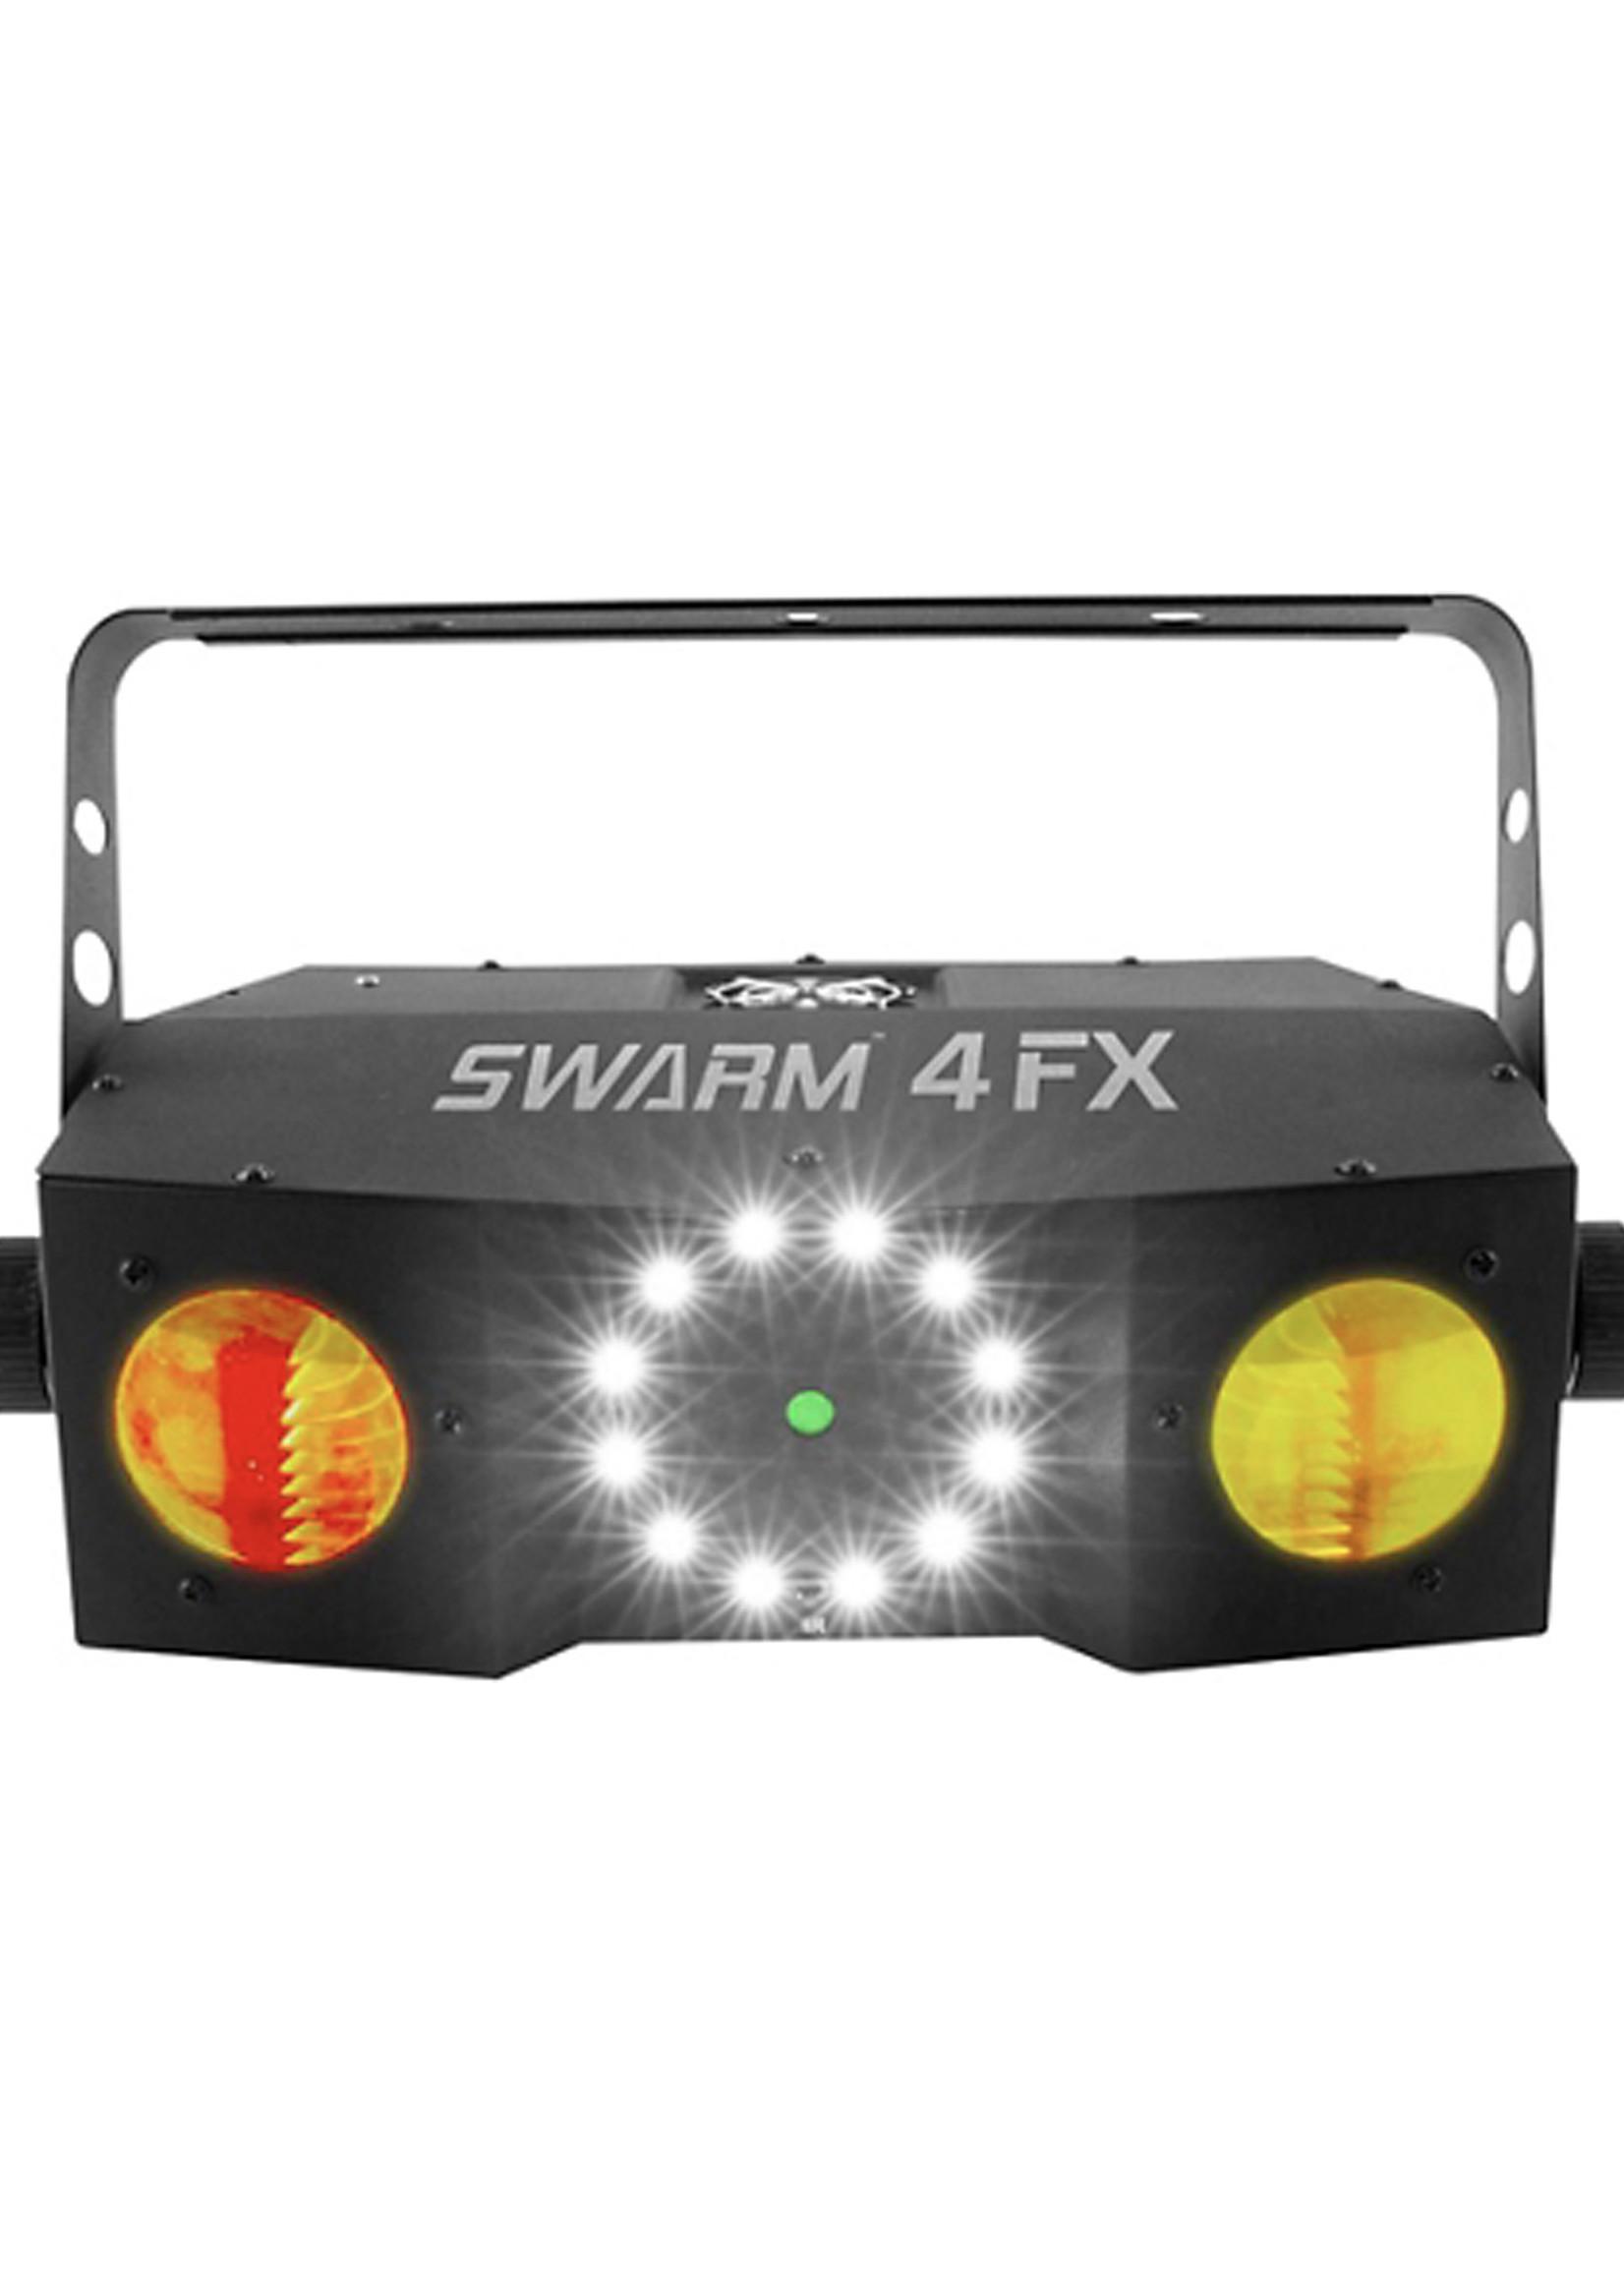 Chauvet Swarm 4 FX